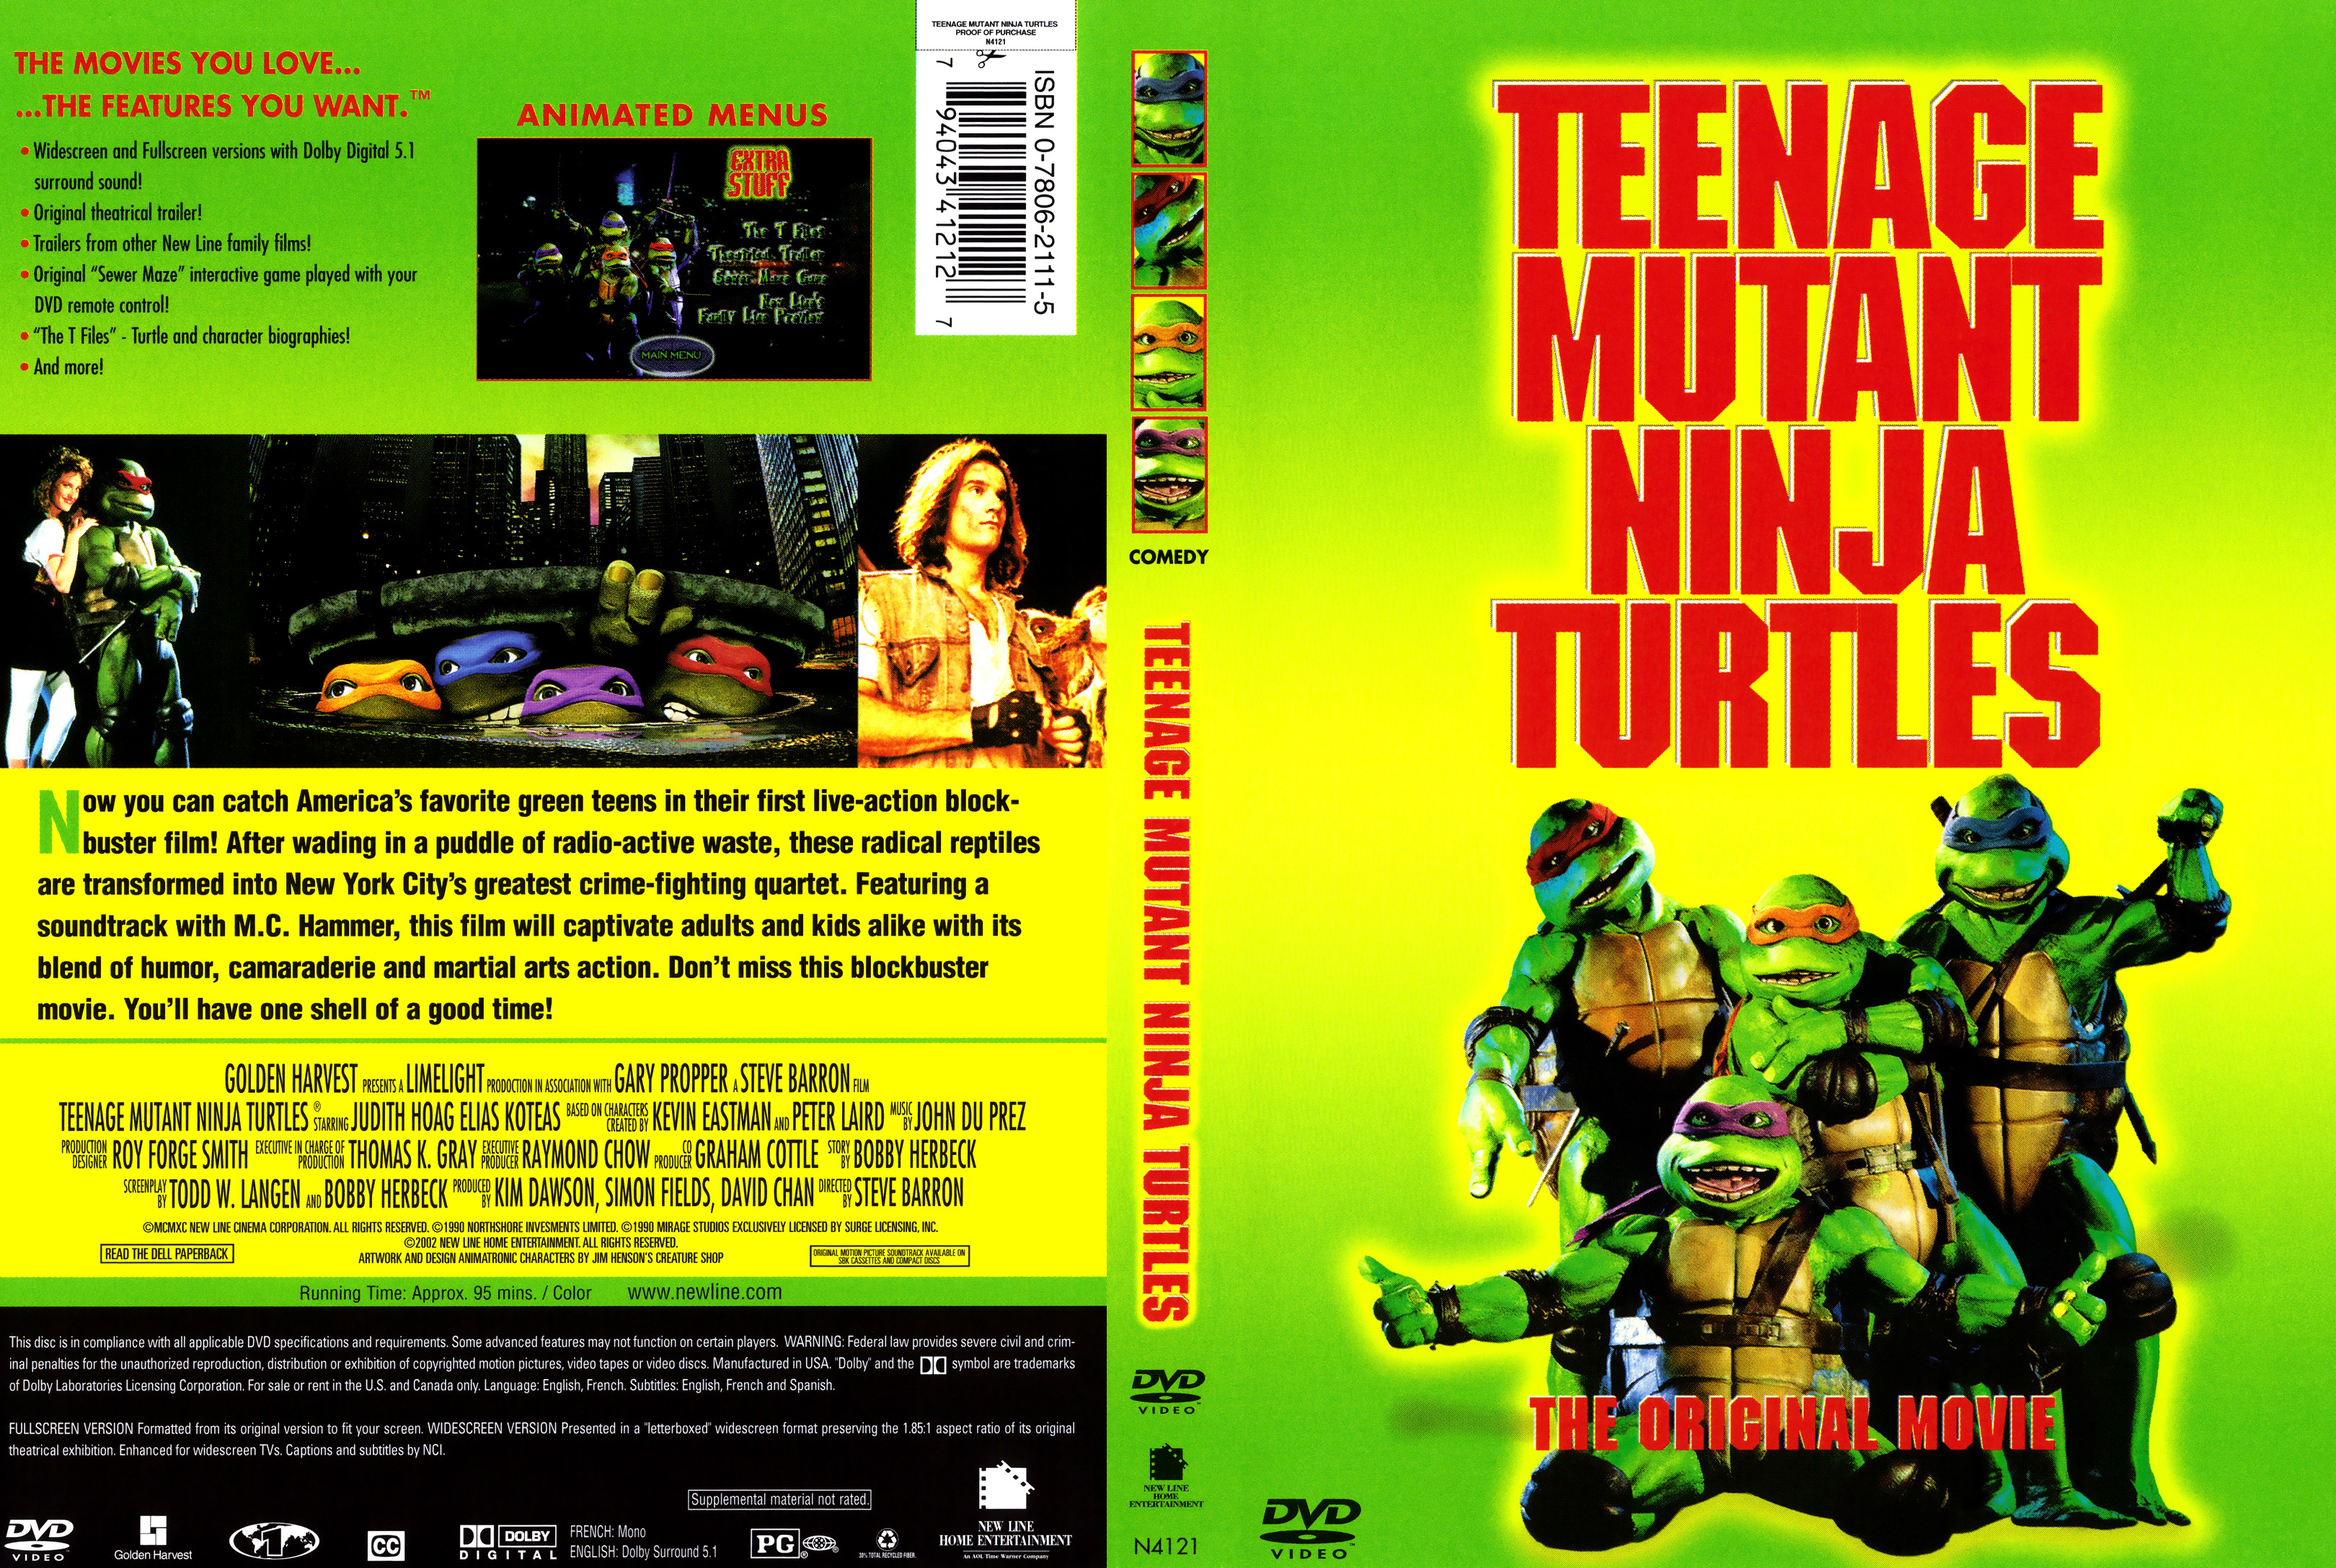 Covers Box Sk Teenage Mutant Ninja Turtles 1990 High Quality Dvd Blueray Movie